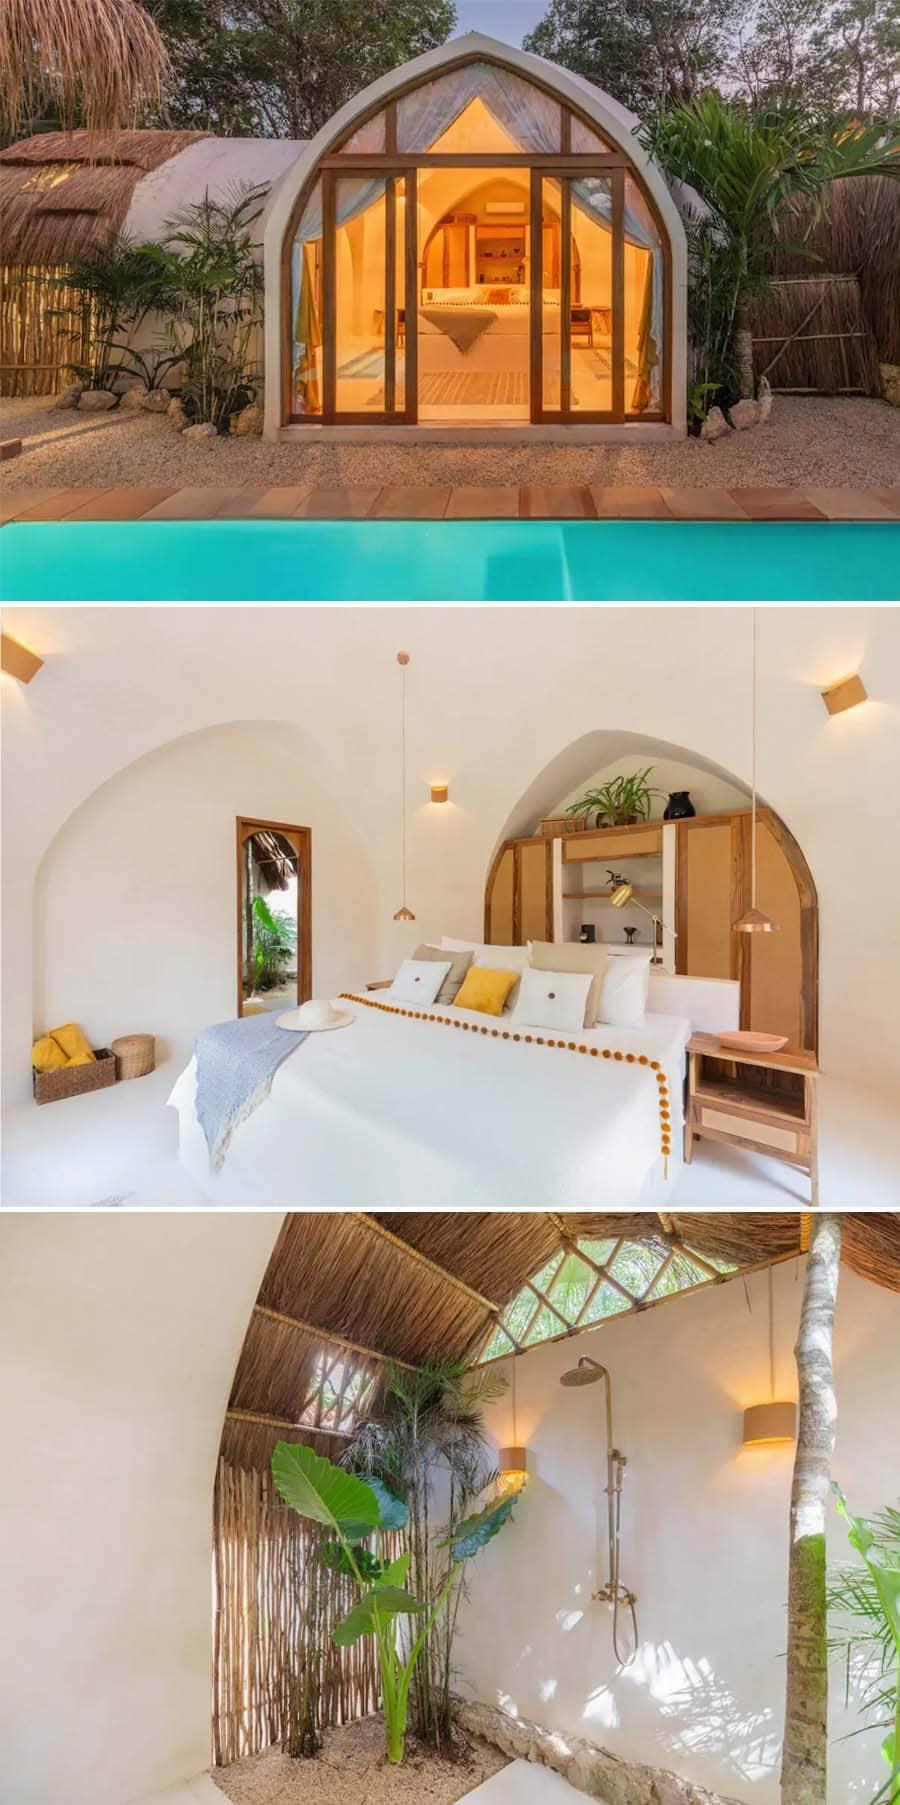 Best Airbnbs in Tulum - Sanah Villas